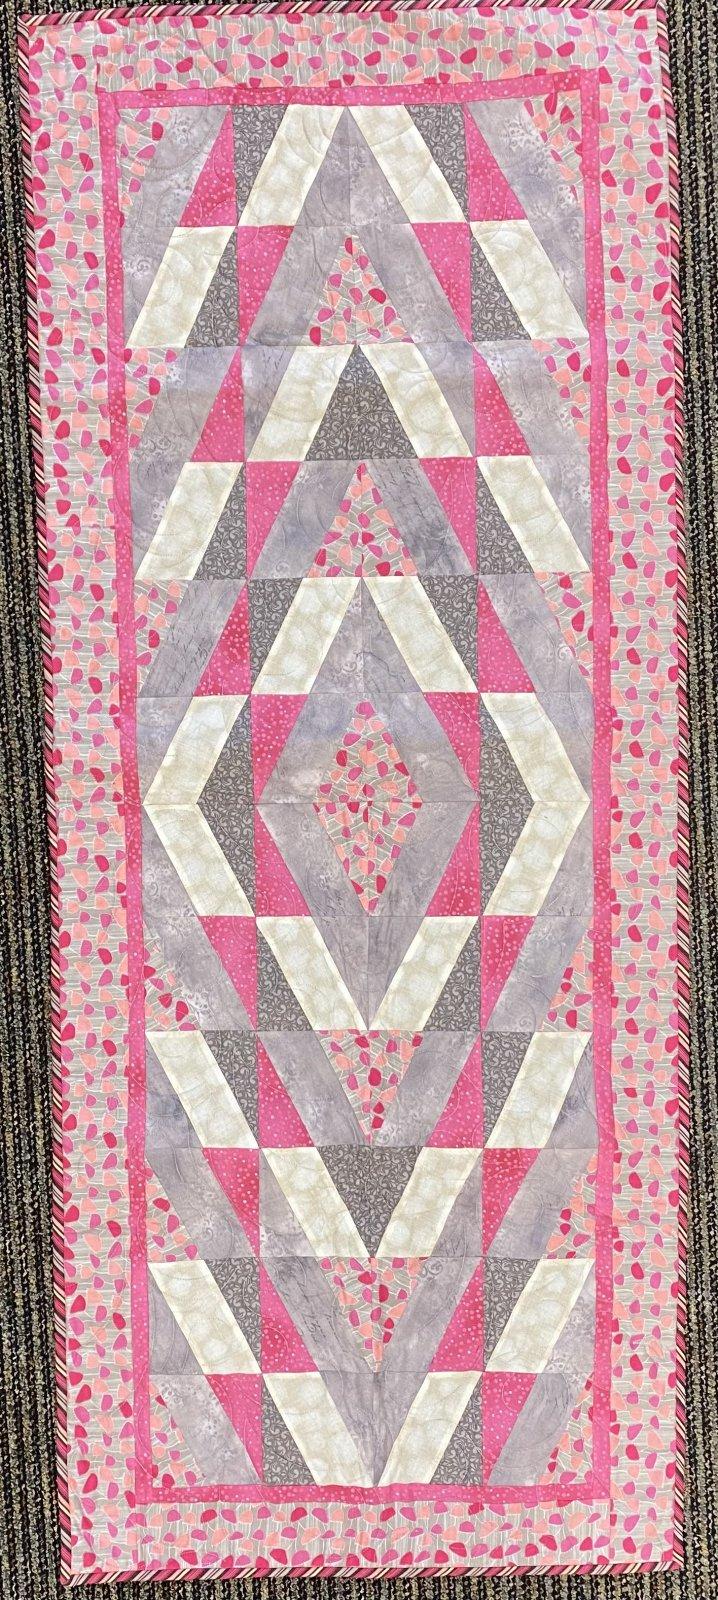 Symmetry Table Runner (pink & gray)